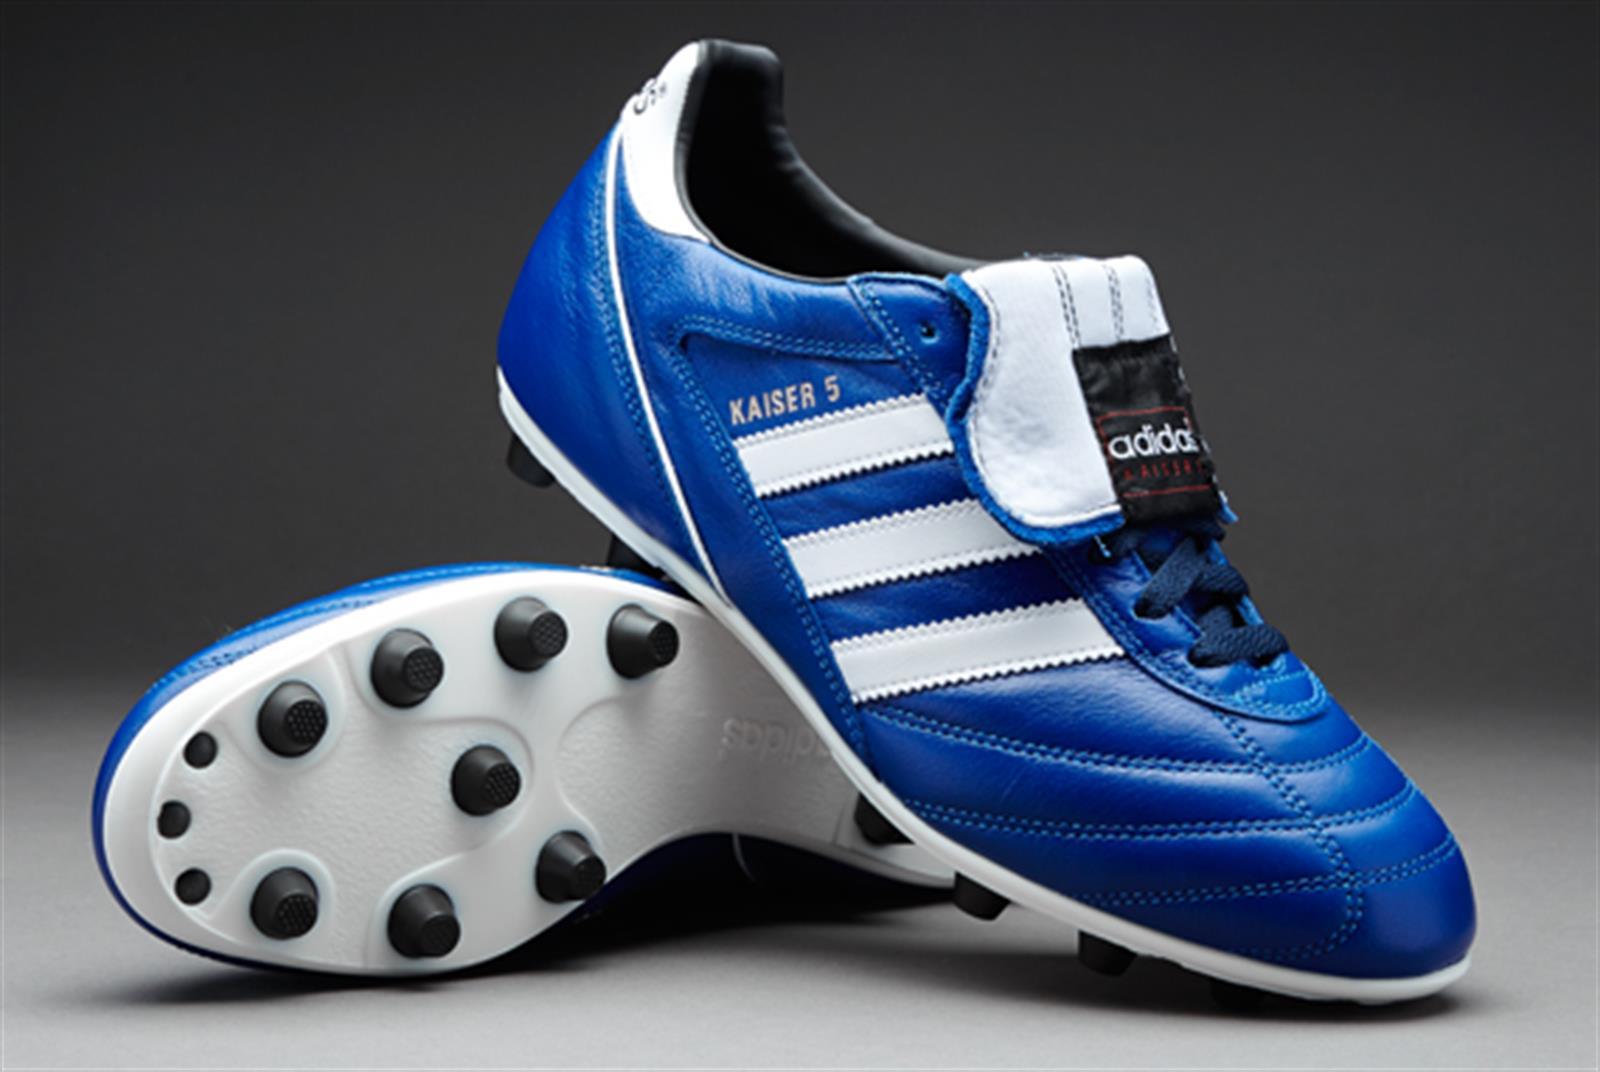 Adidas Kaiser Blu